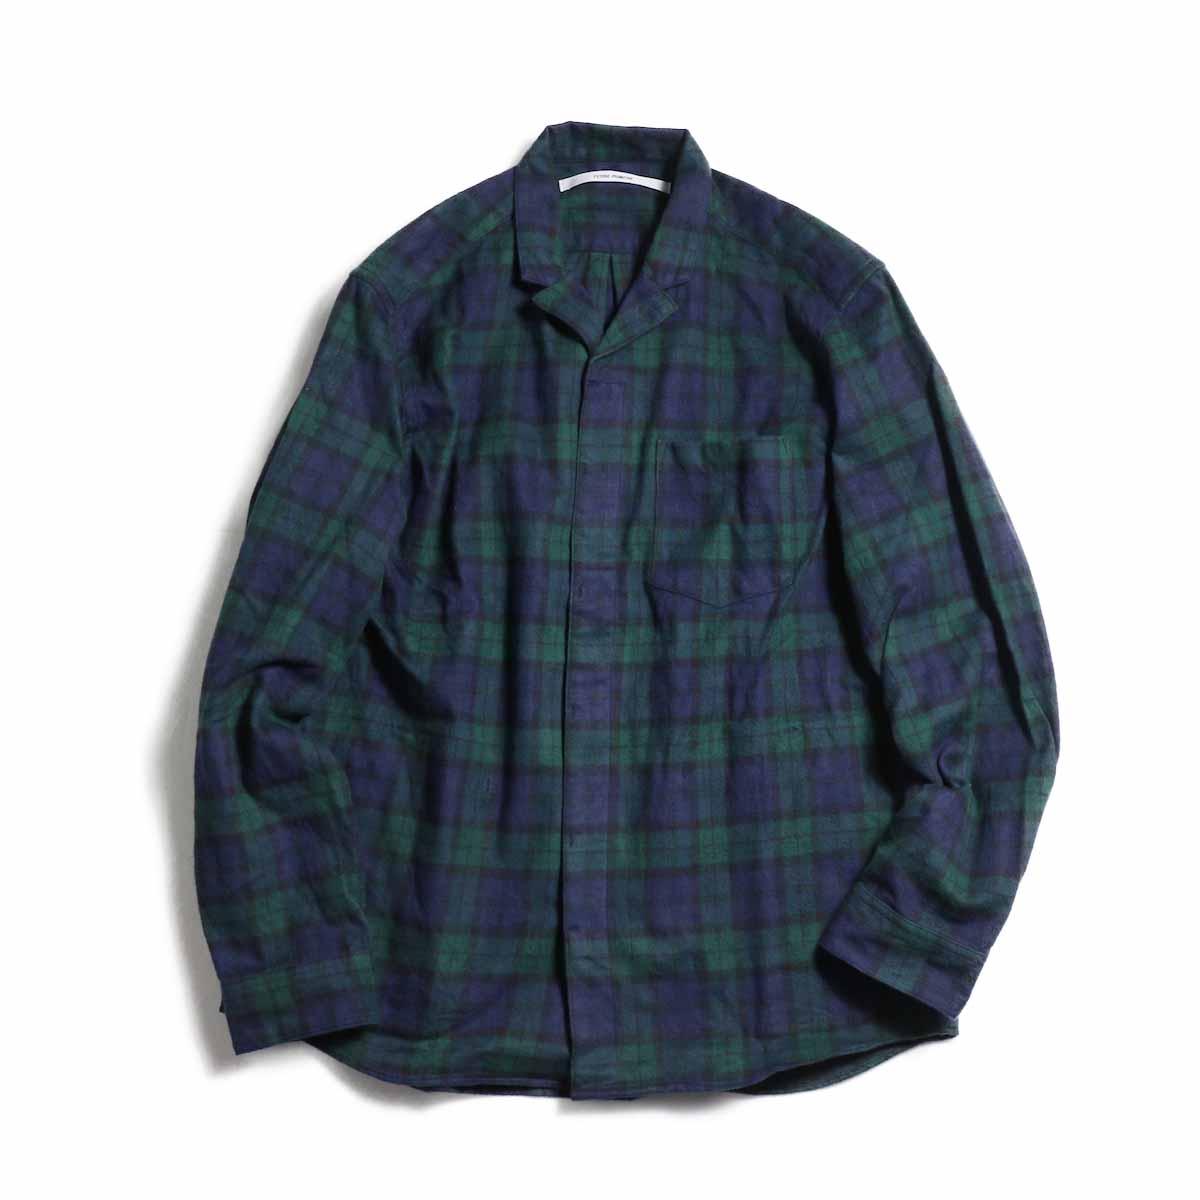 FUTURE PRIMITIVE / FP Notched Shirt(Tartan) -Black